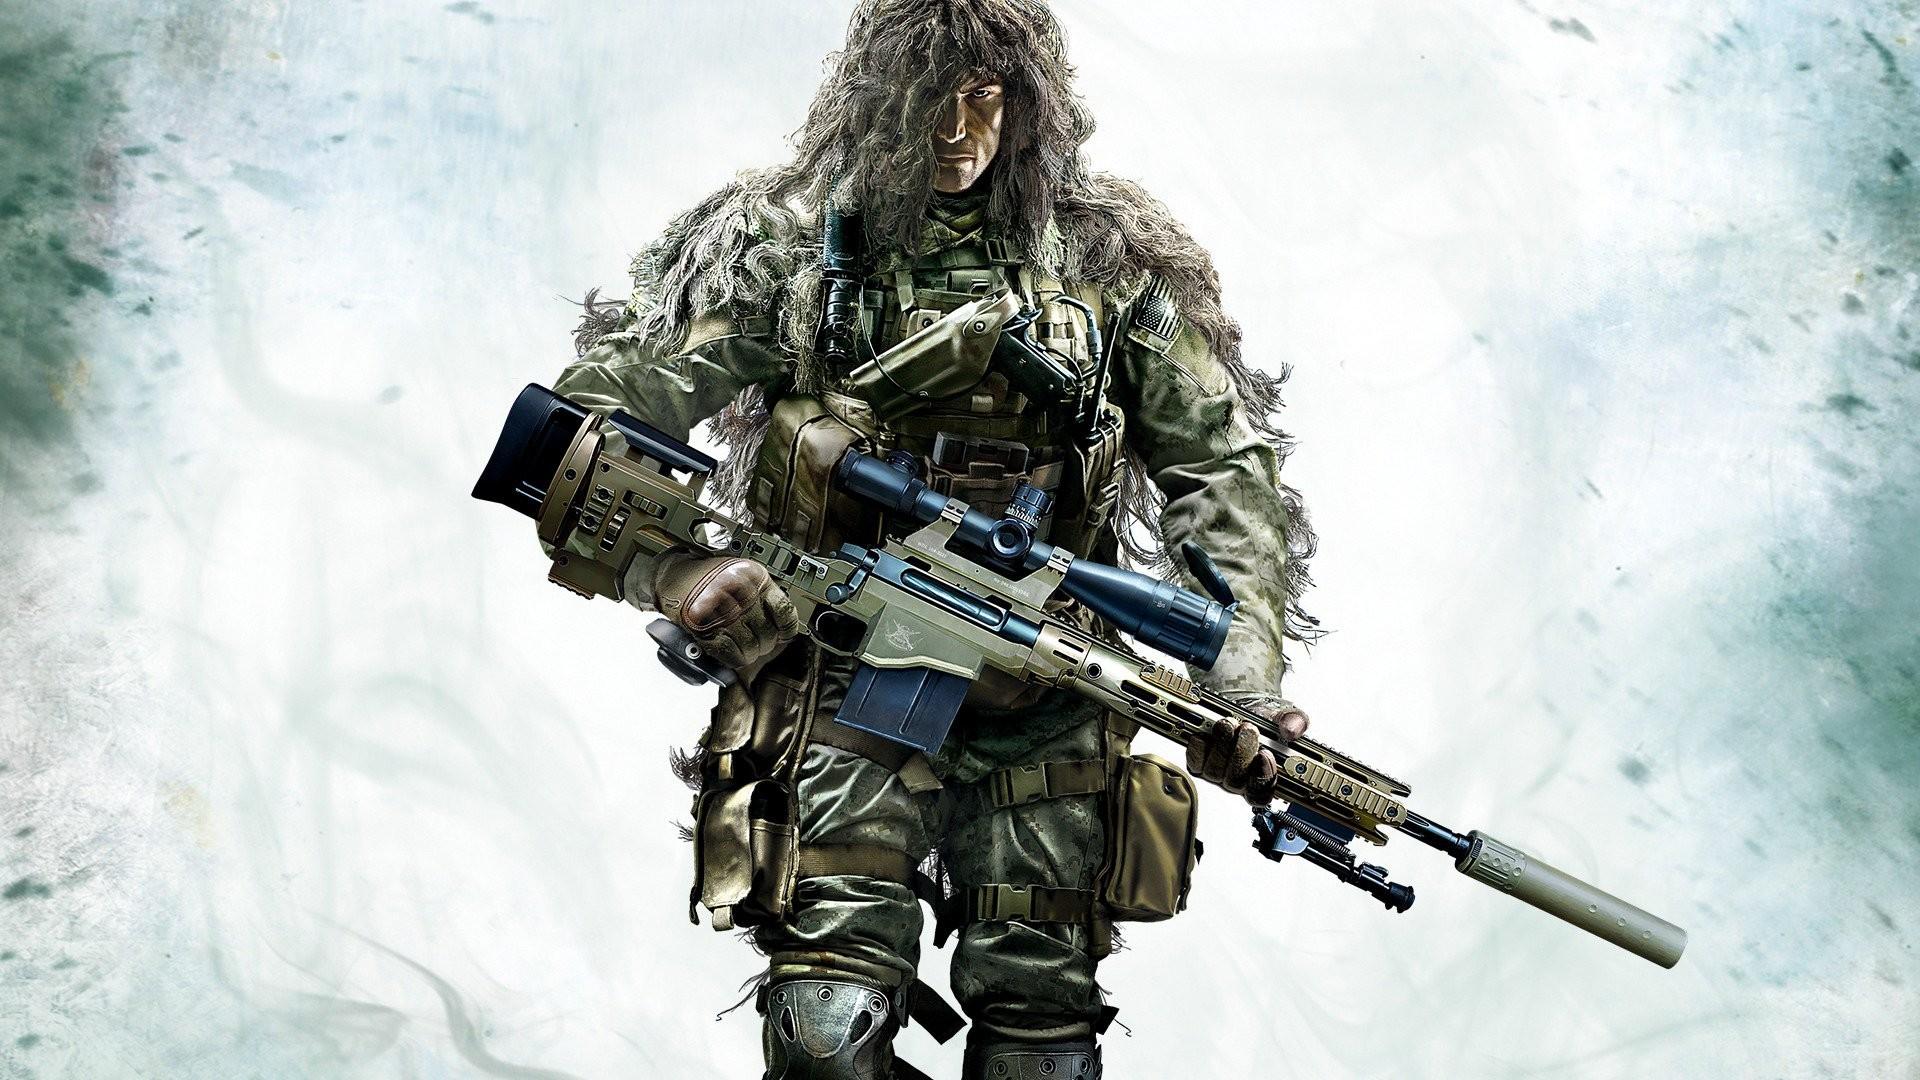 16 Sniper: Ghost Warrior 2 HD Wallpapers | Backgrounds – Wallpaper